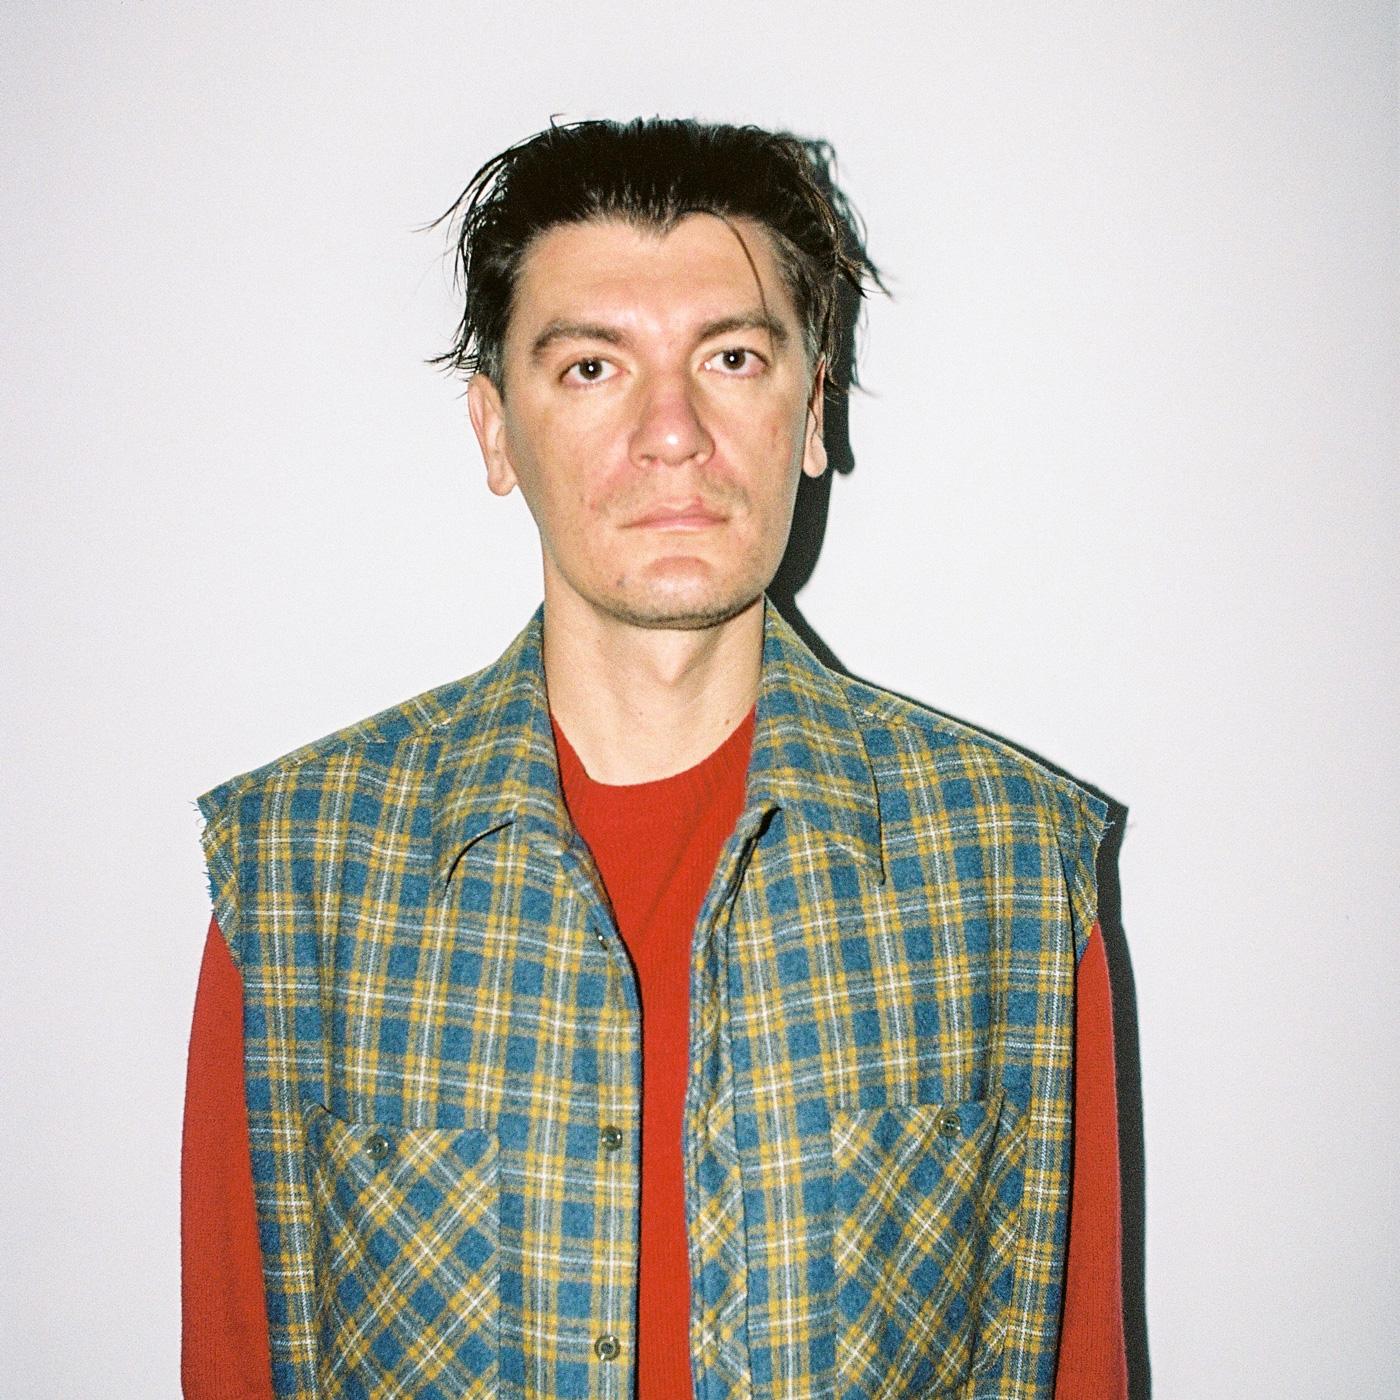 Александр Гудков. Фото: Алексей Киселев